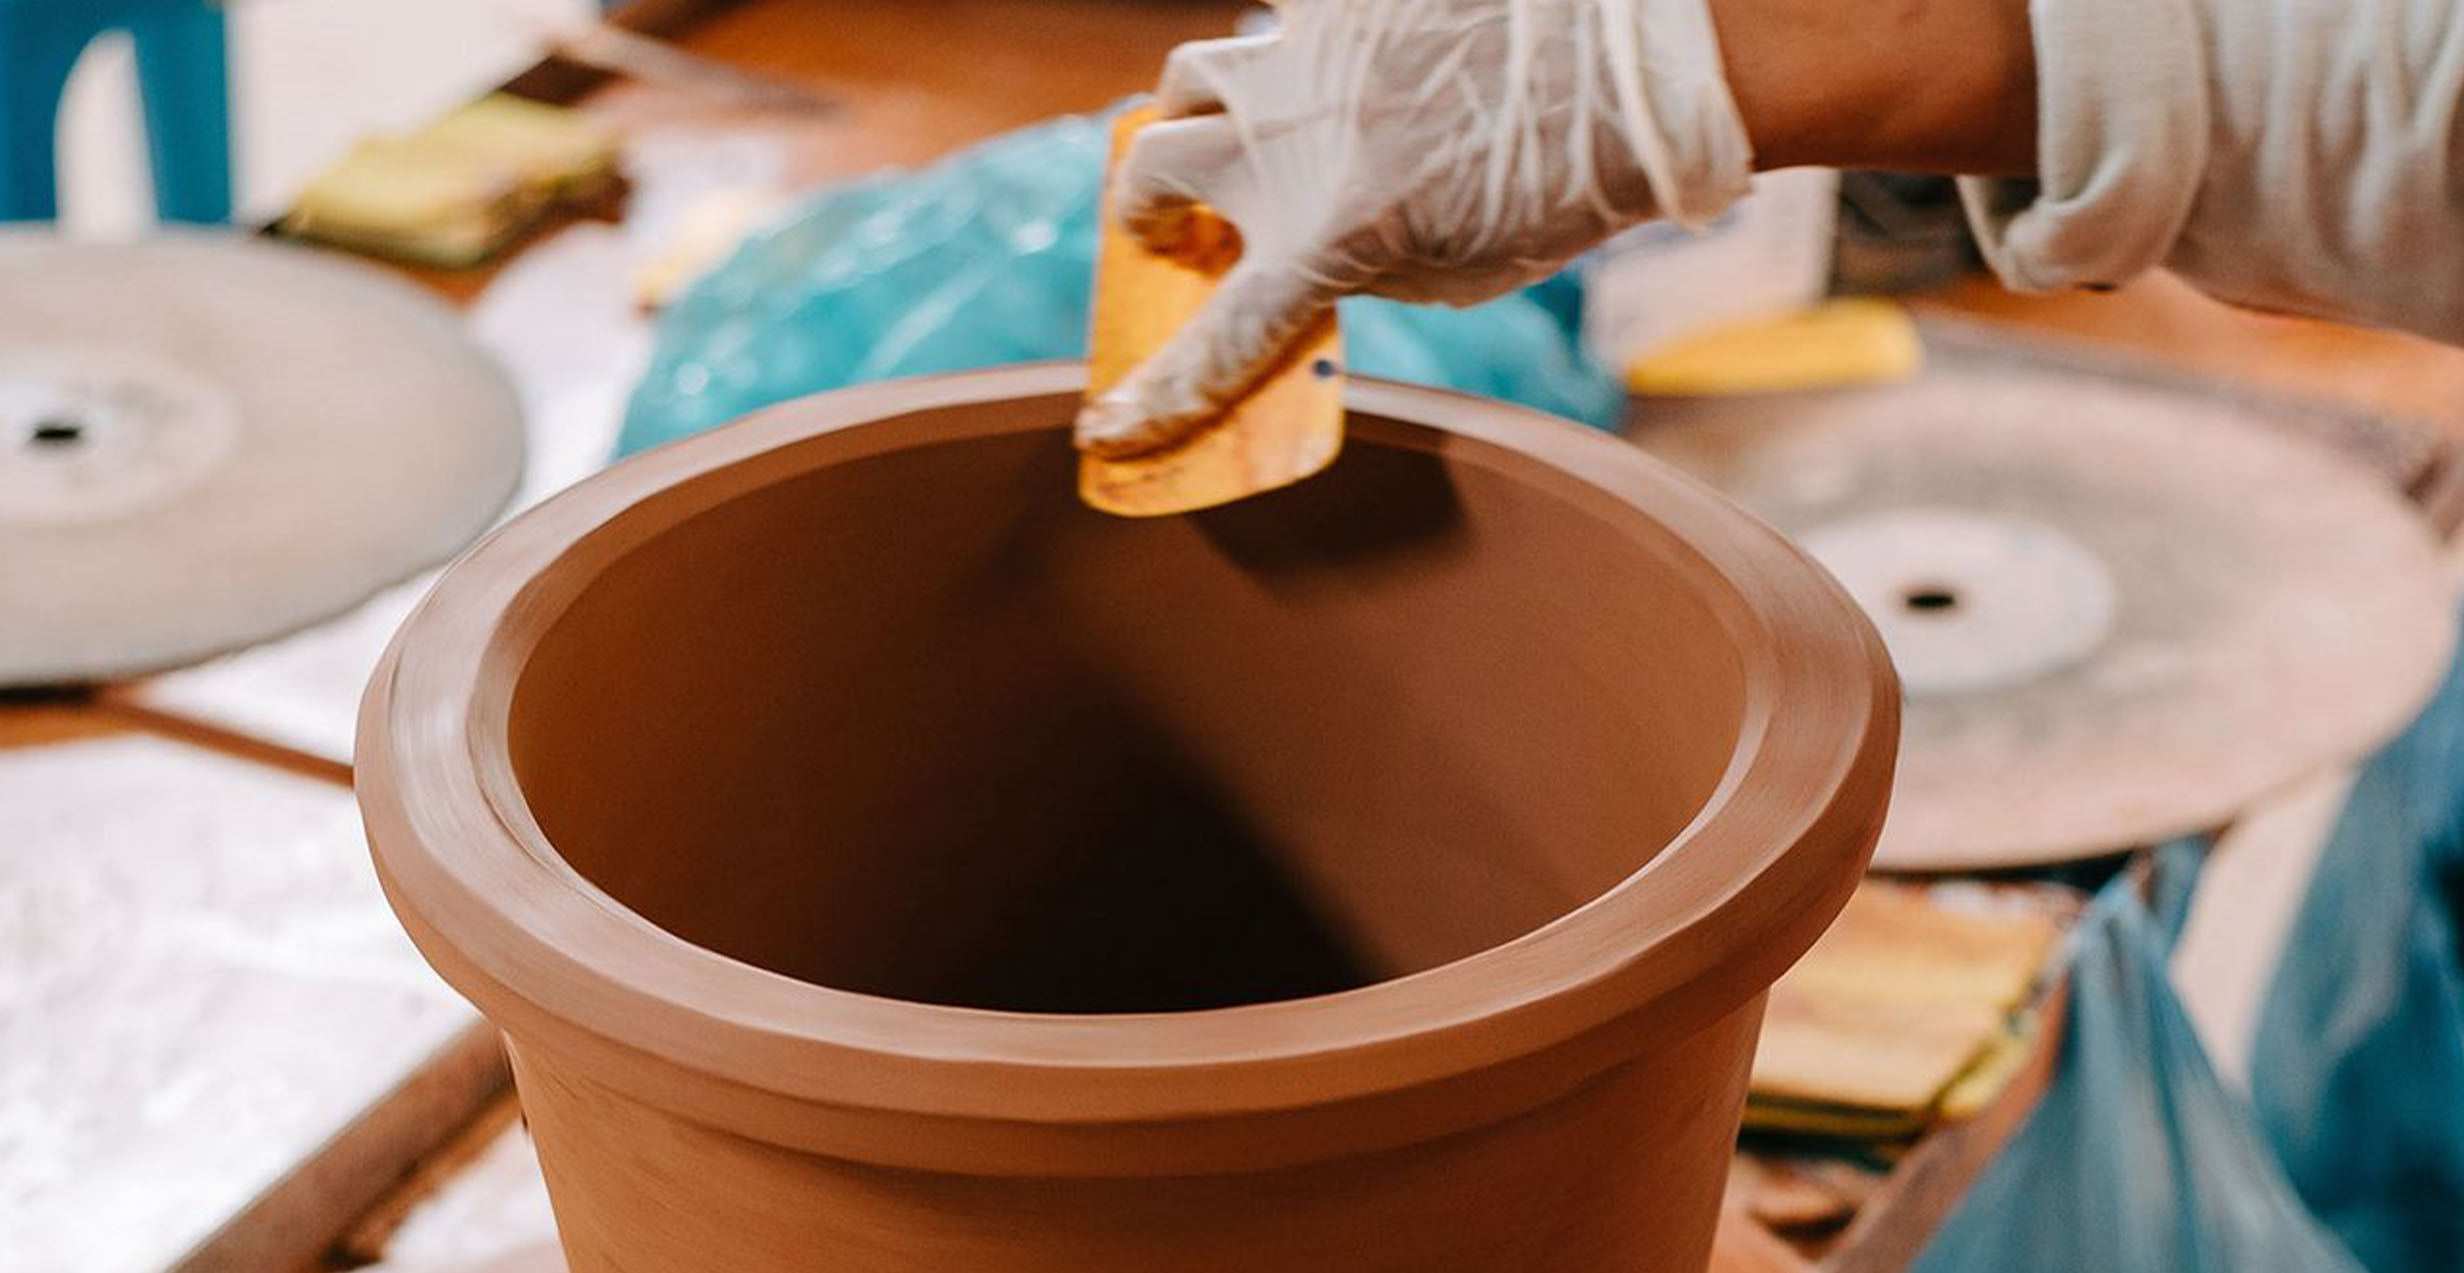 klimaneutrales-unternehmen-soulbottles-keramikfilter-4